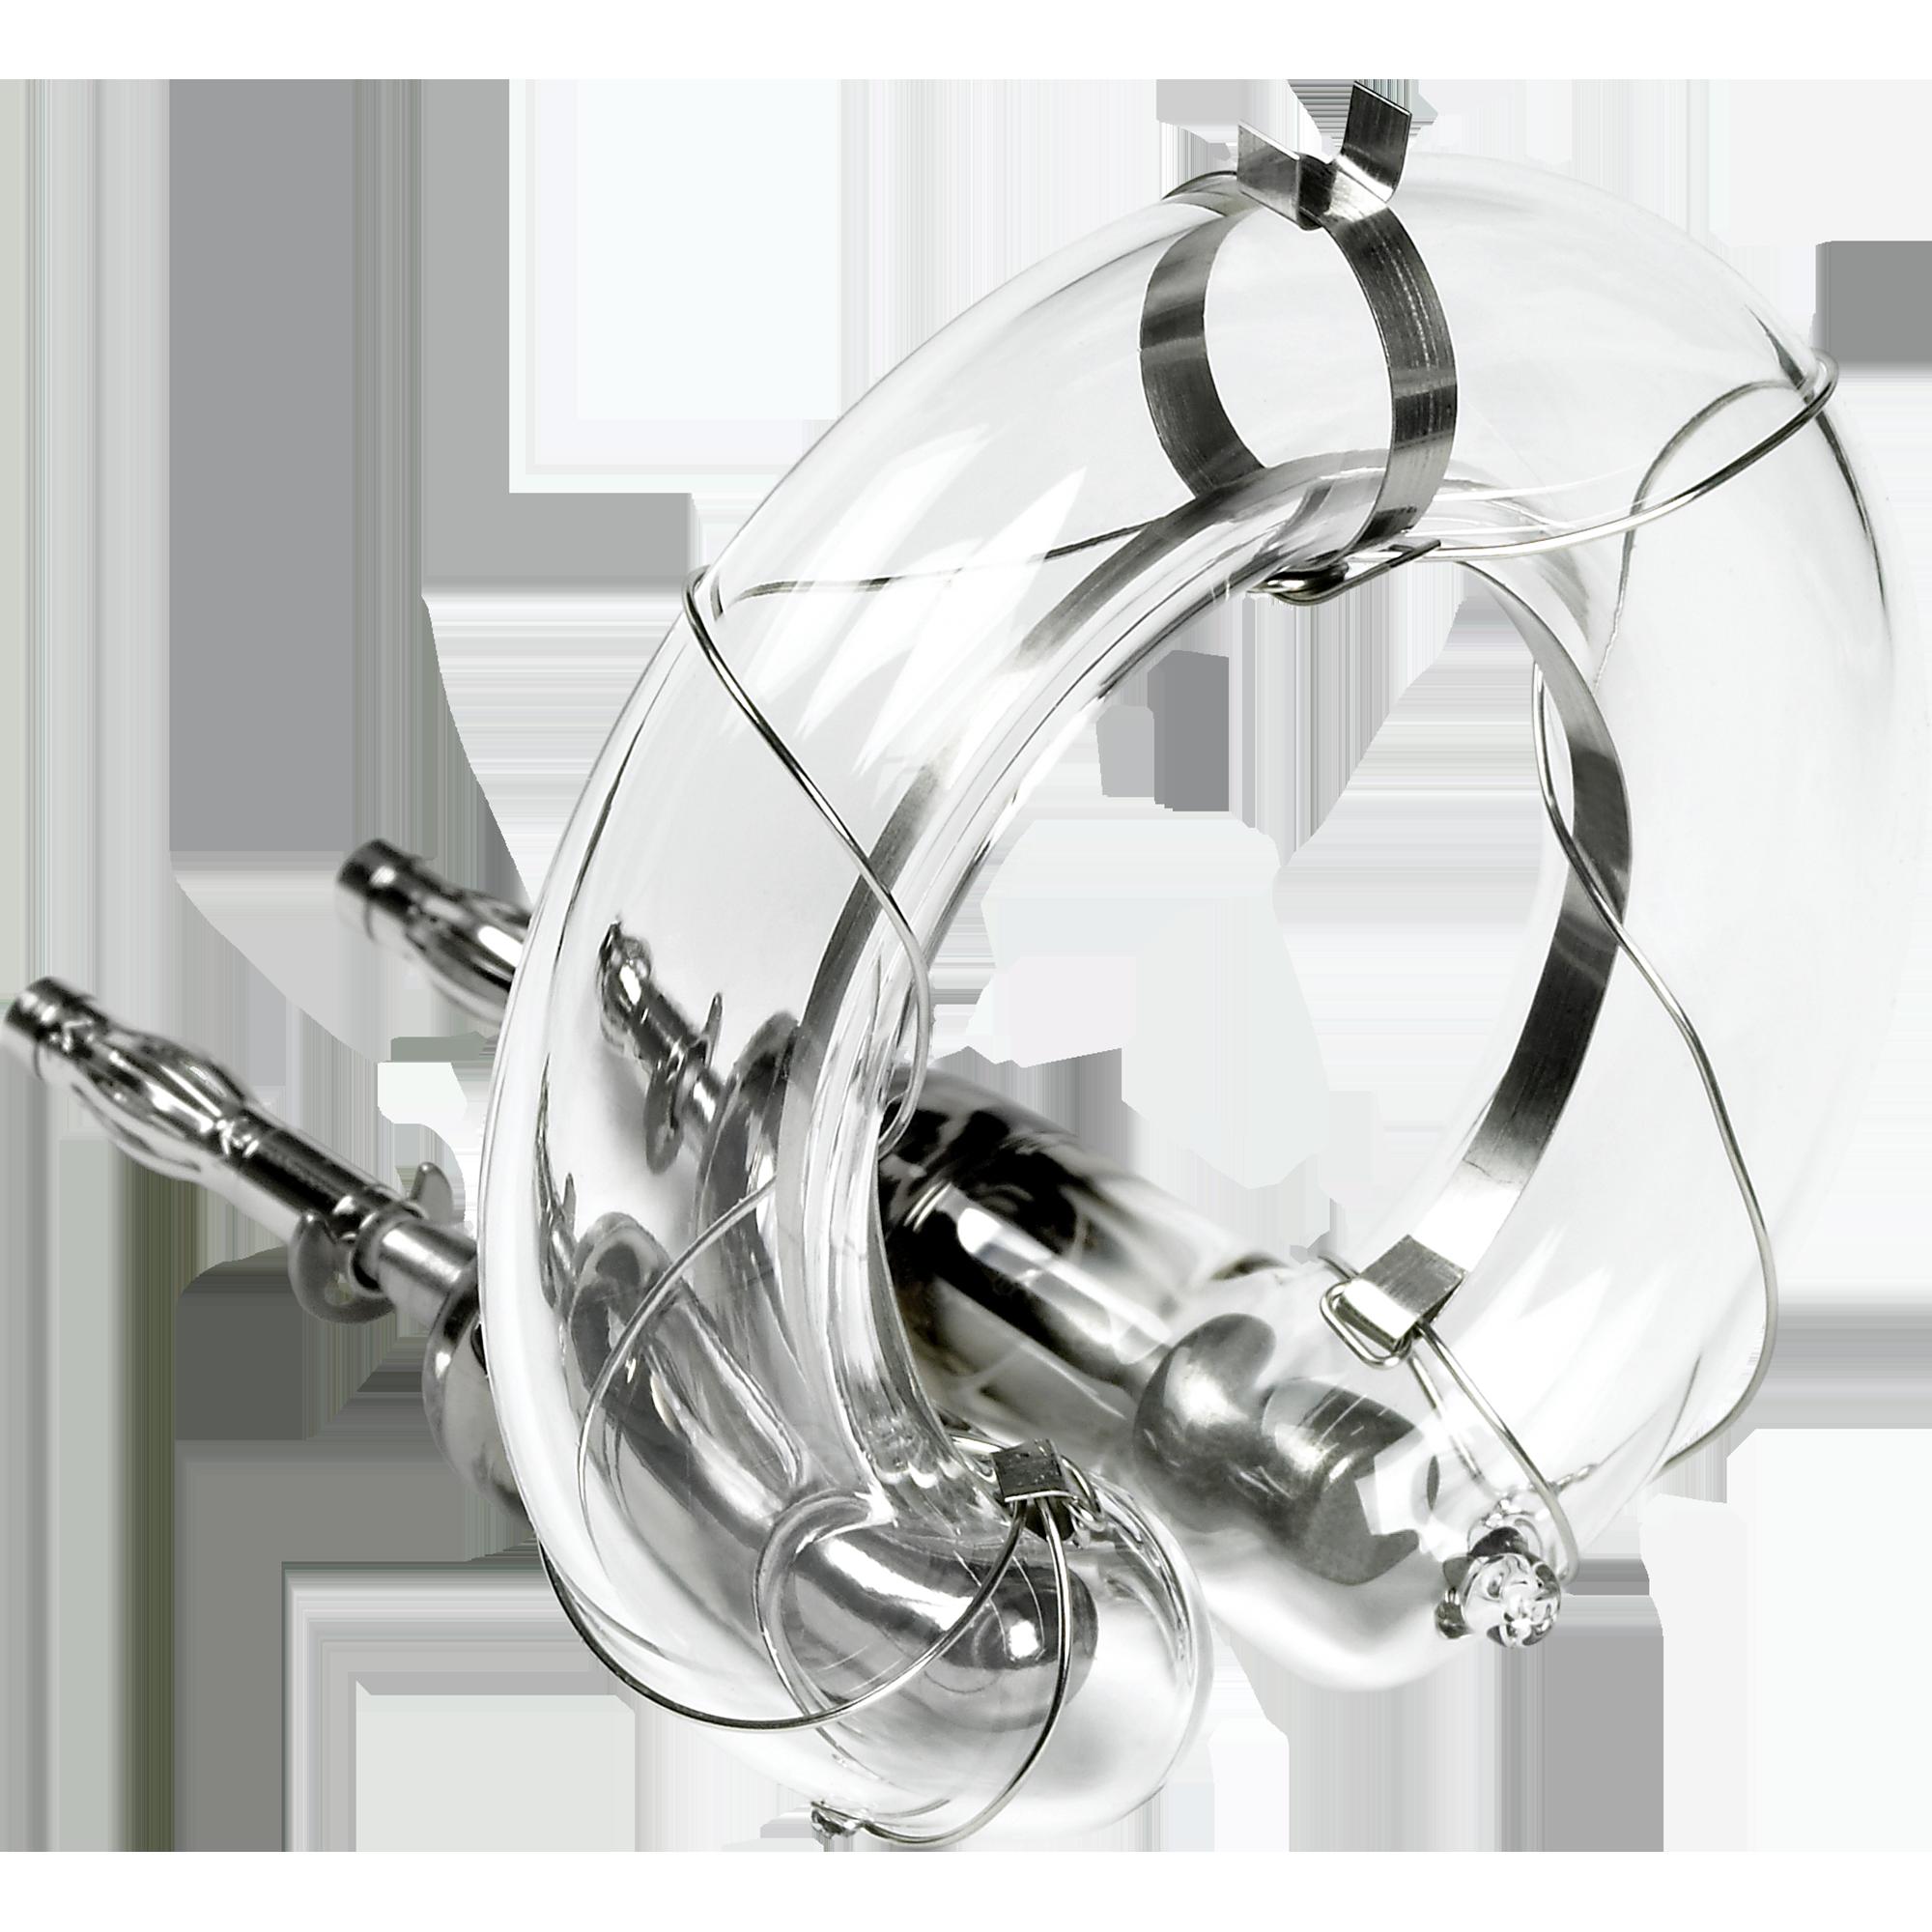 Profoto Acute D4 Head Studio Lighting Flash Head